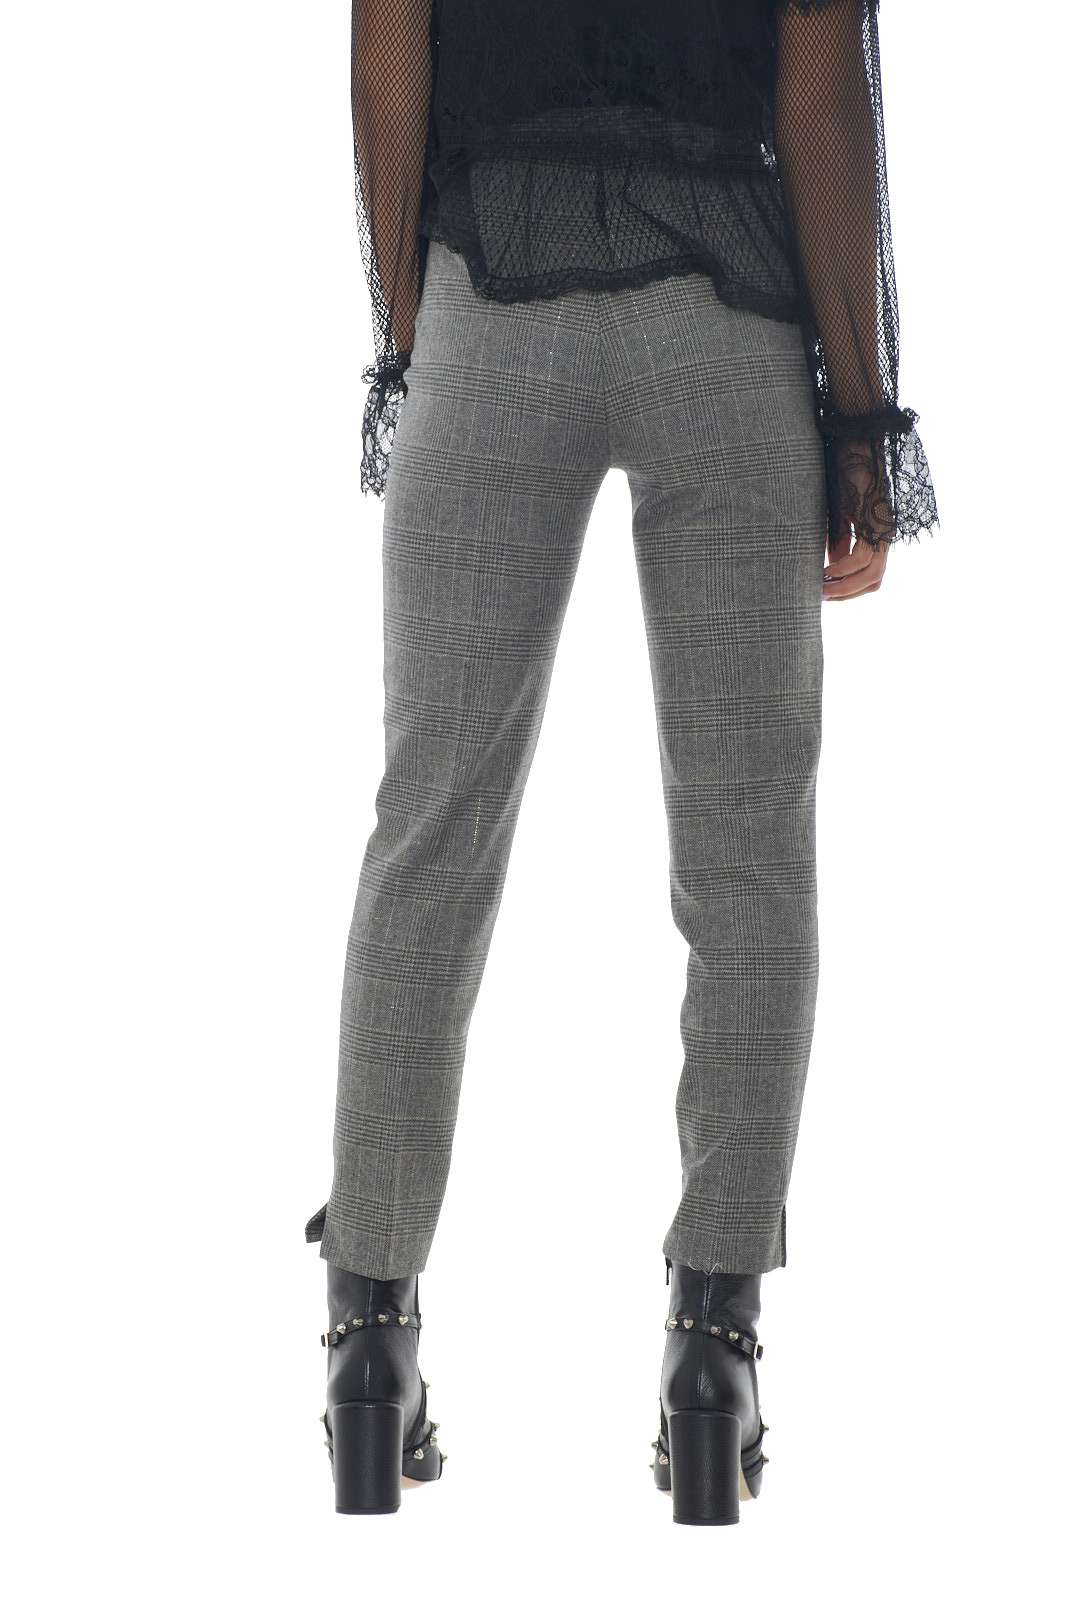 https://www.parmax.com/media/catalog/product/a/i/AI-outlet_parmax-pantaloni-donna-Twin-Set-192TT2440-C.jpg